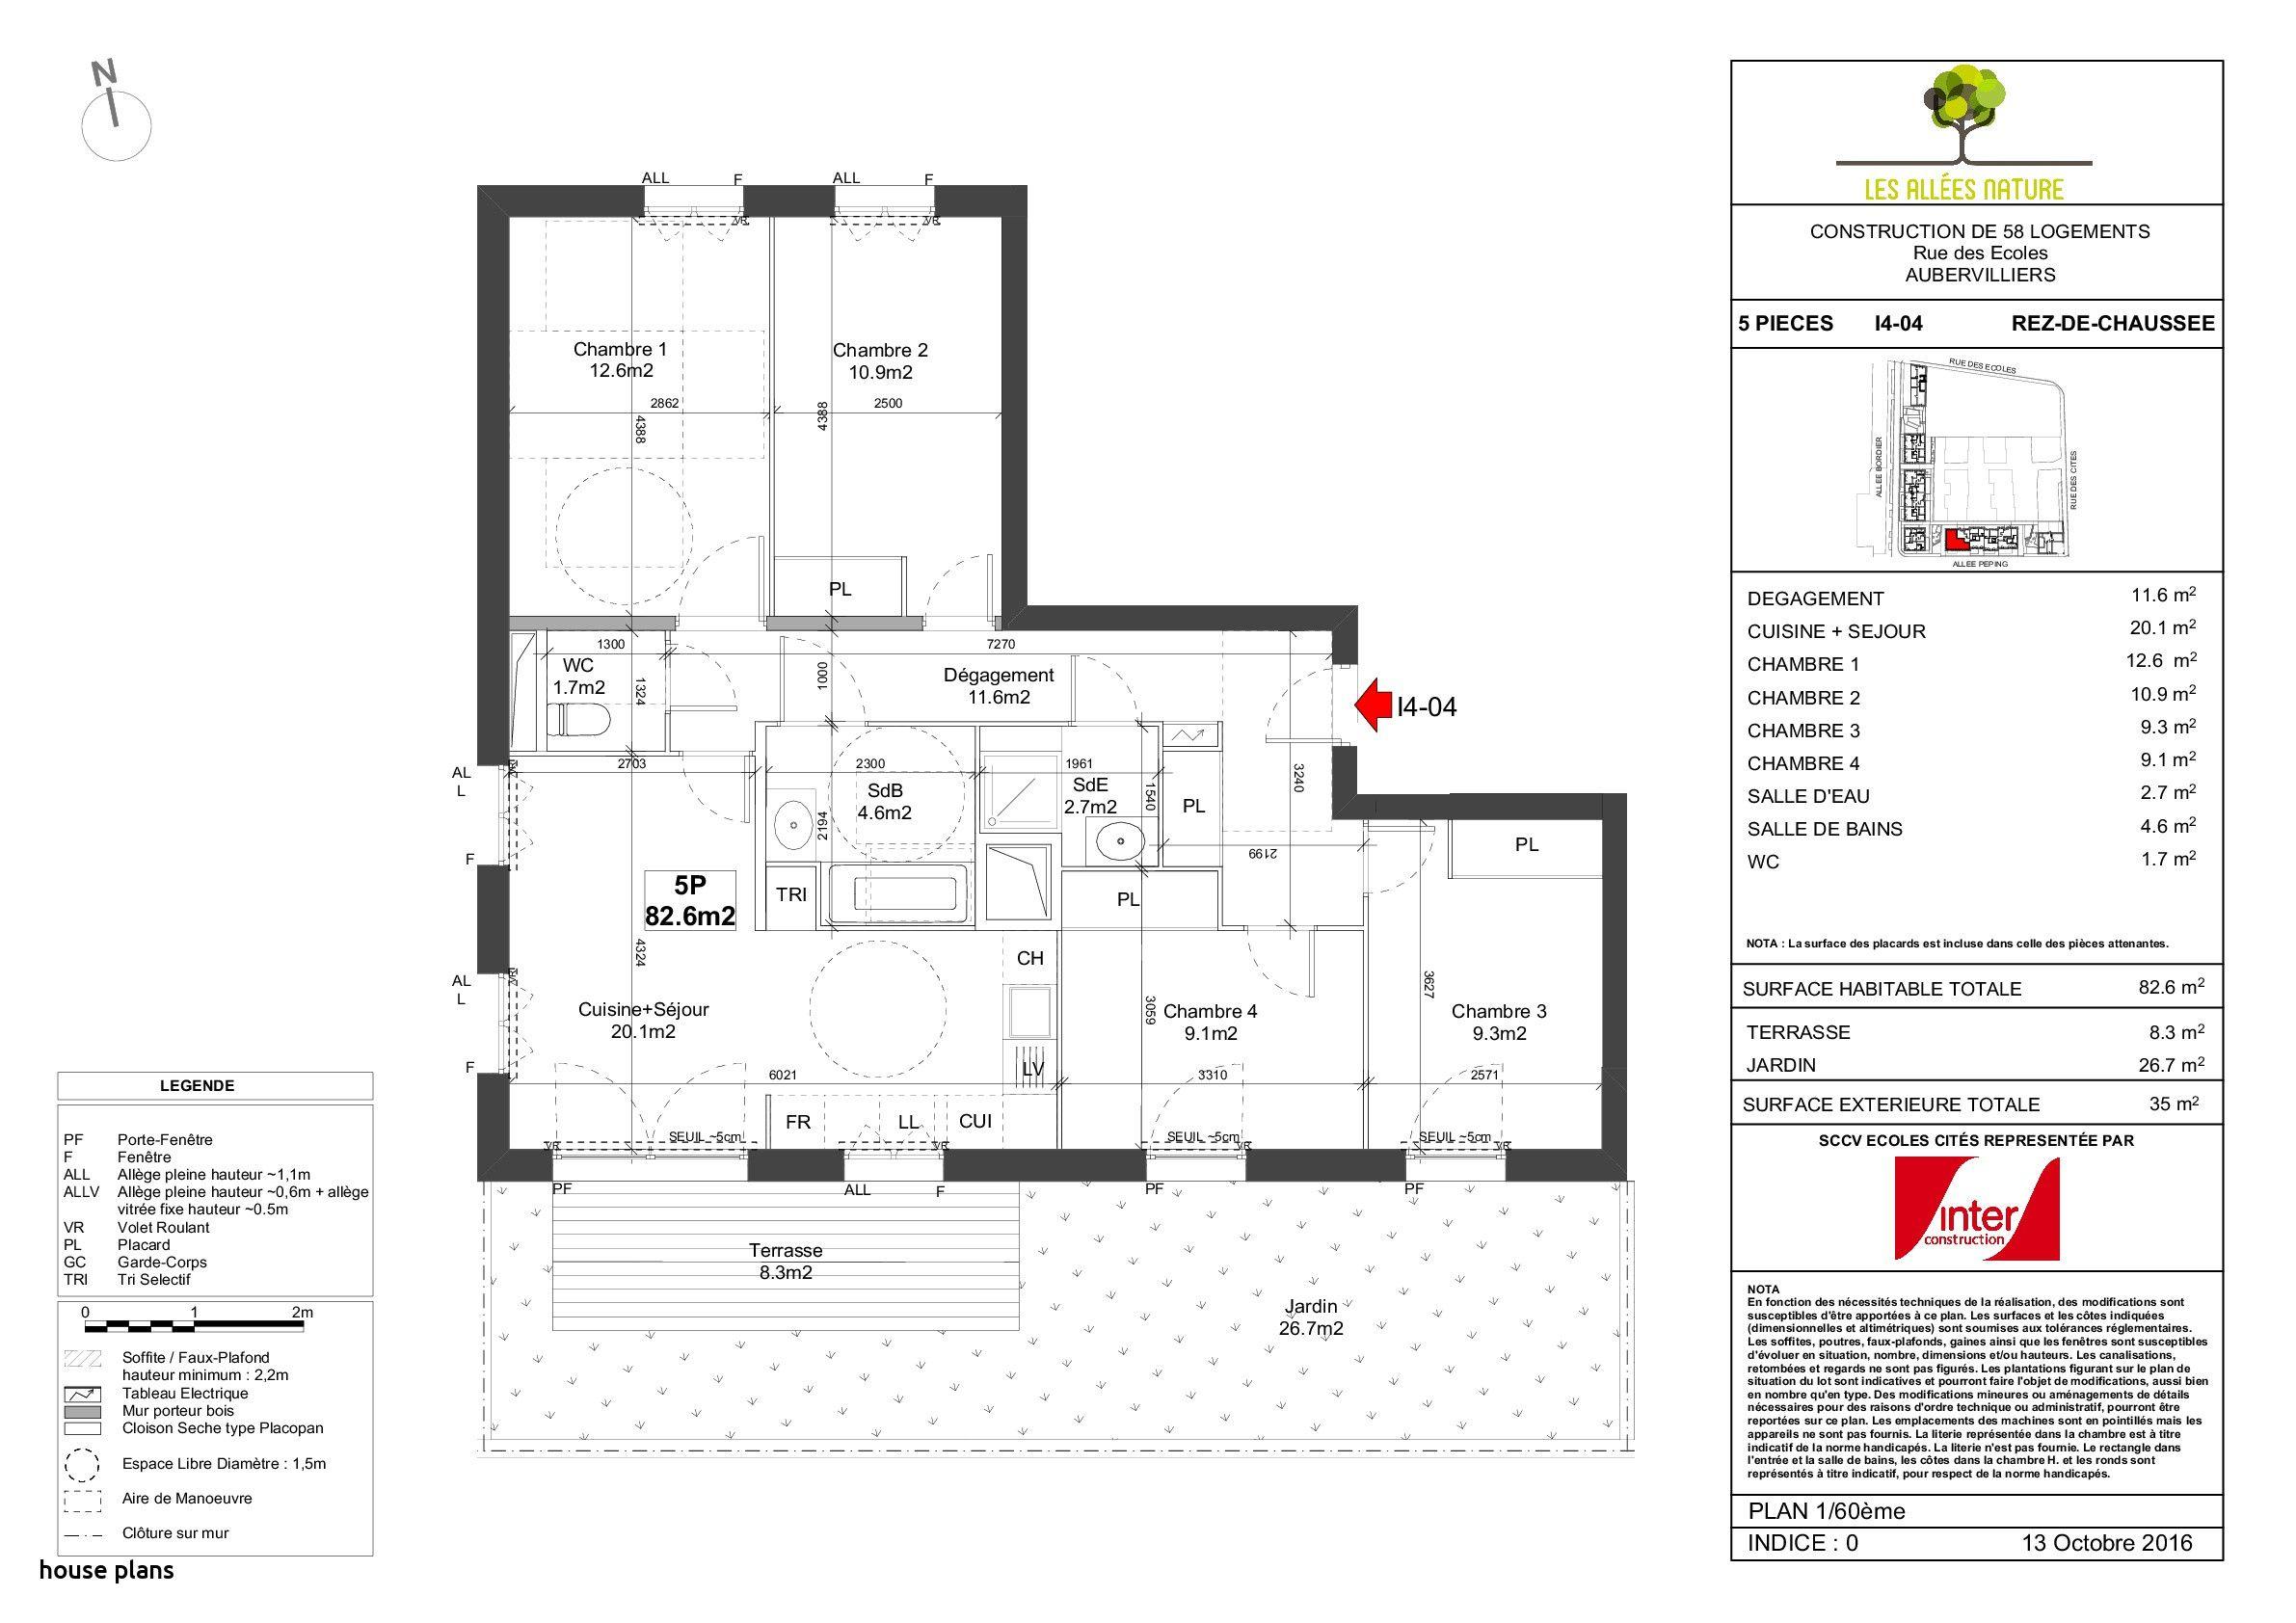 Maison Carree Floor Plan